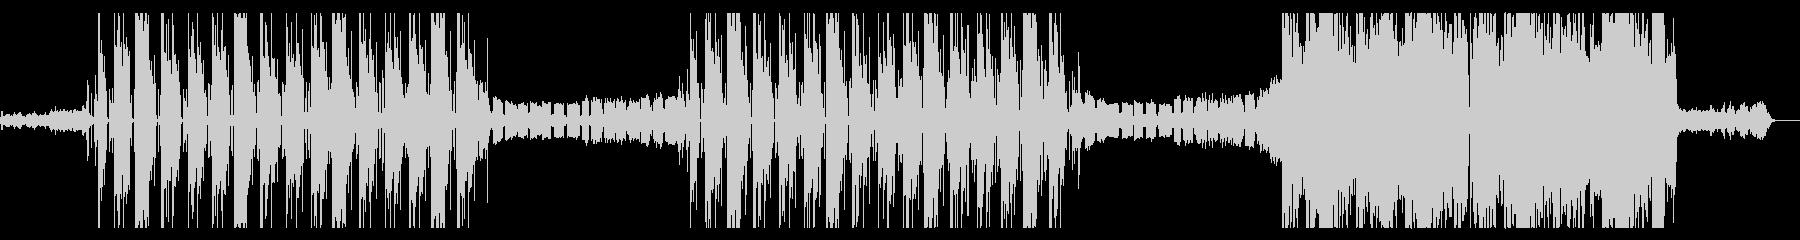 K-POP ハード TRAP EDMの未再生の波形